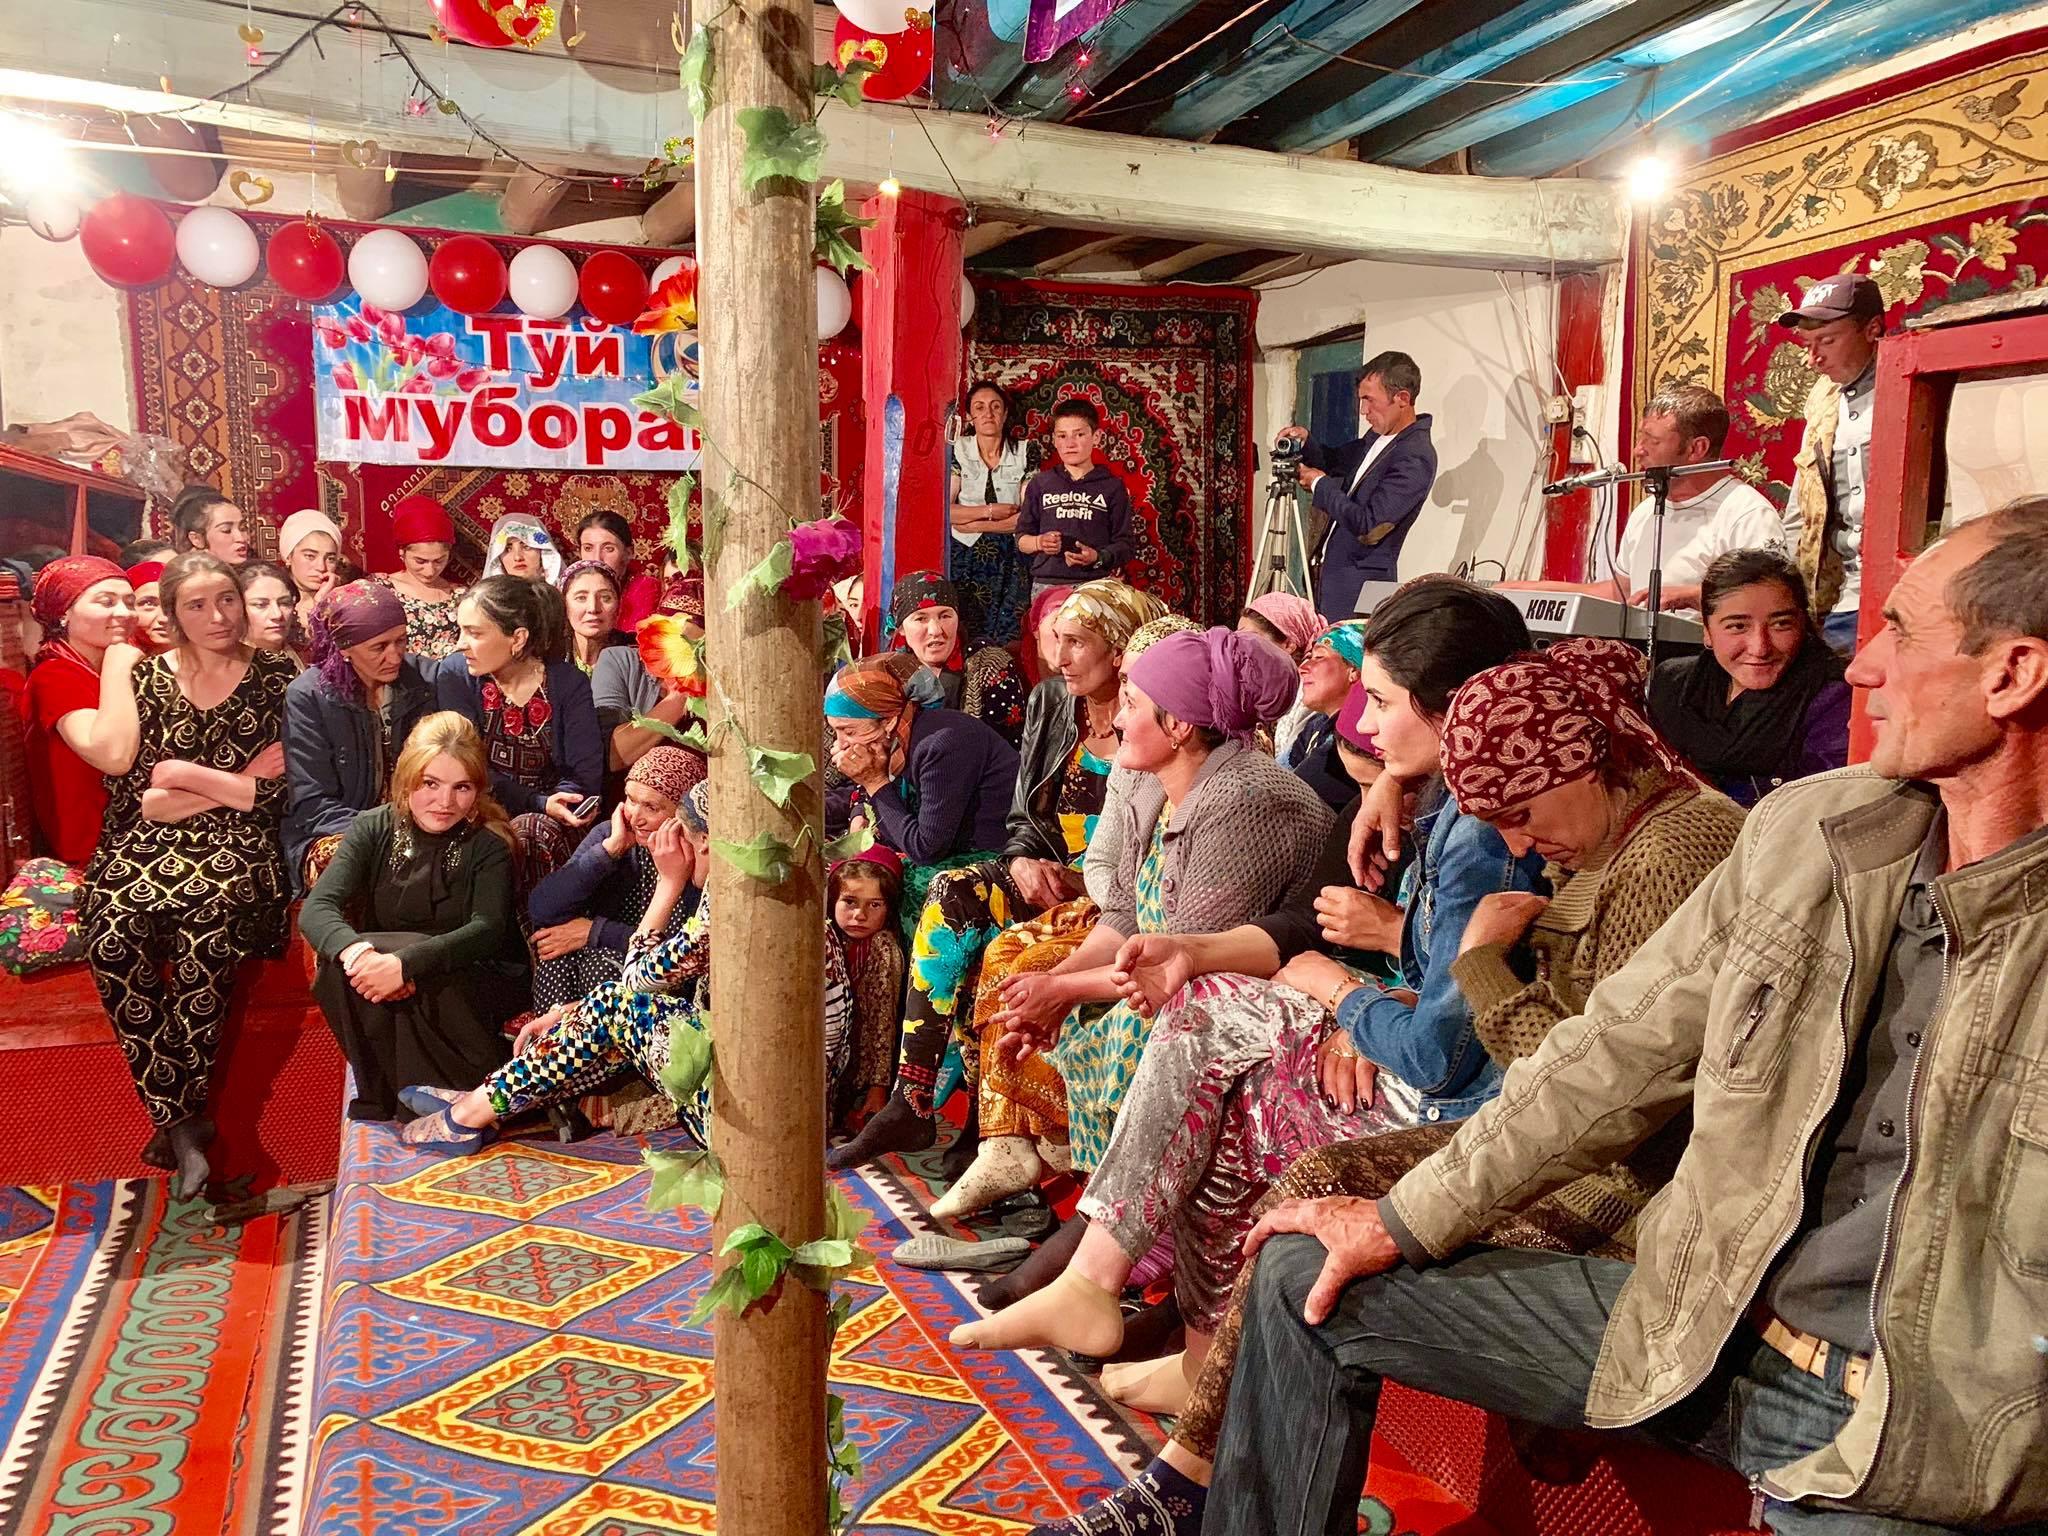 Kach Solo Travels in 2019 Experiencing a Traditional Wakhan Wedding in Tajikistan6.jpg